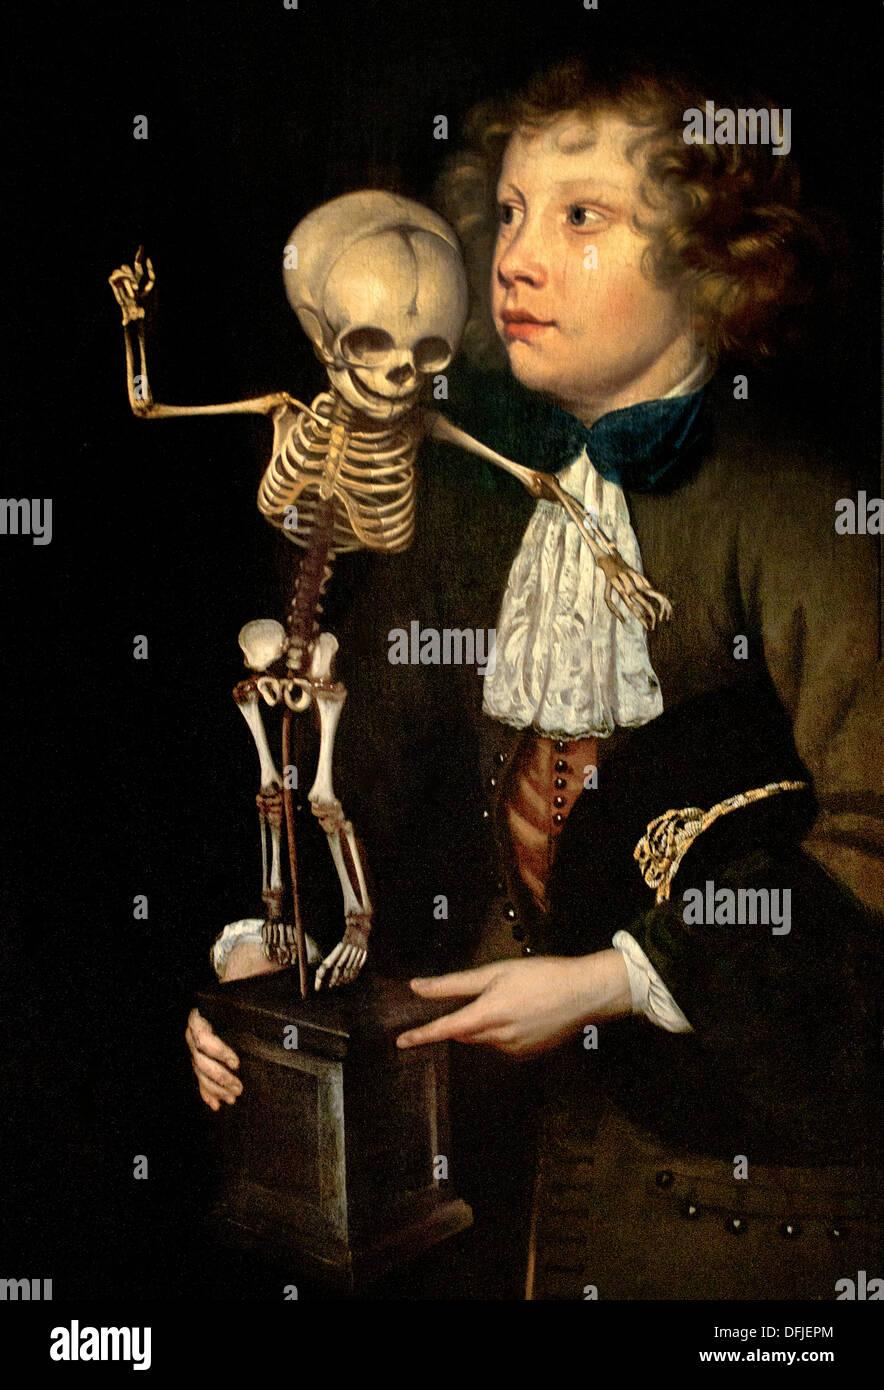 Anatomy Lesson Stock Photos & Anatomy Lesson Stock Images - Alamy